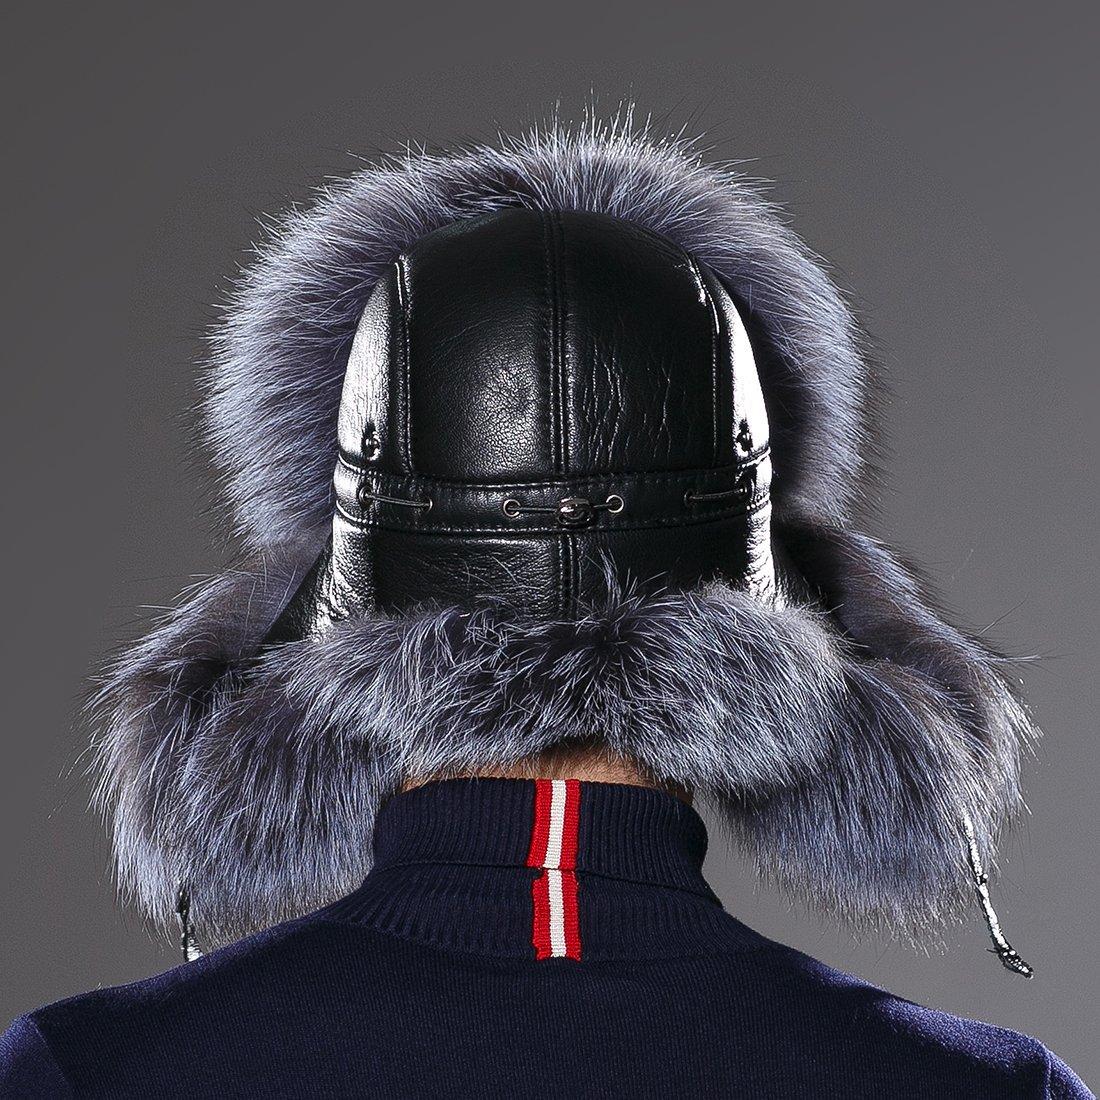 URSFUR Winter Mens Trapper Hat Real Leather Silver Fox Fur Russian Ushanka Cap by URSFUR (Image #8)